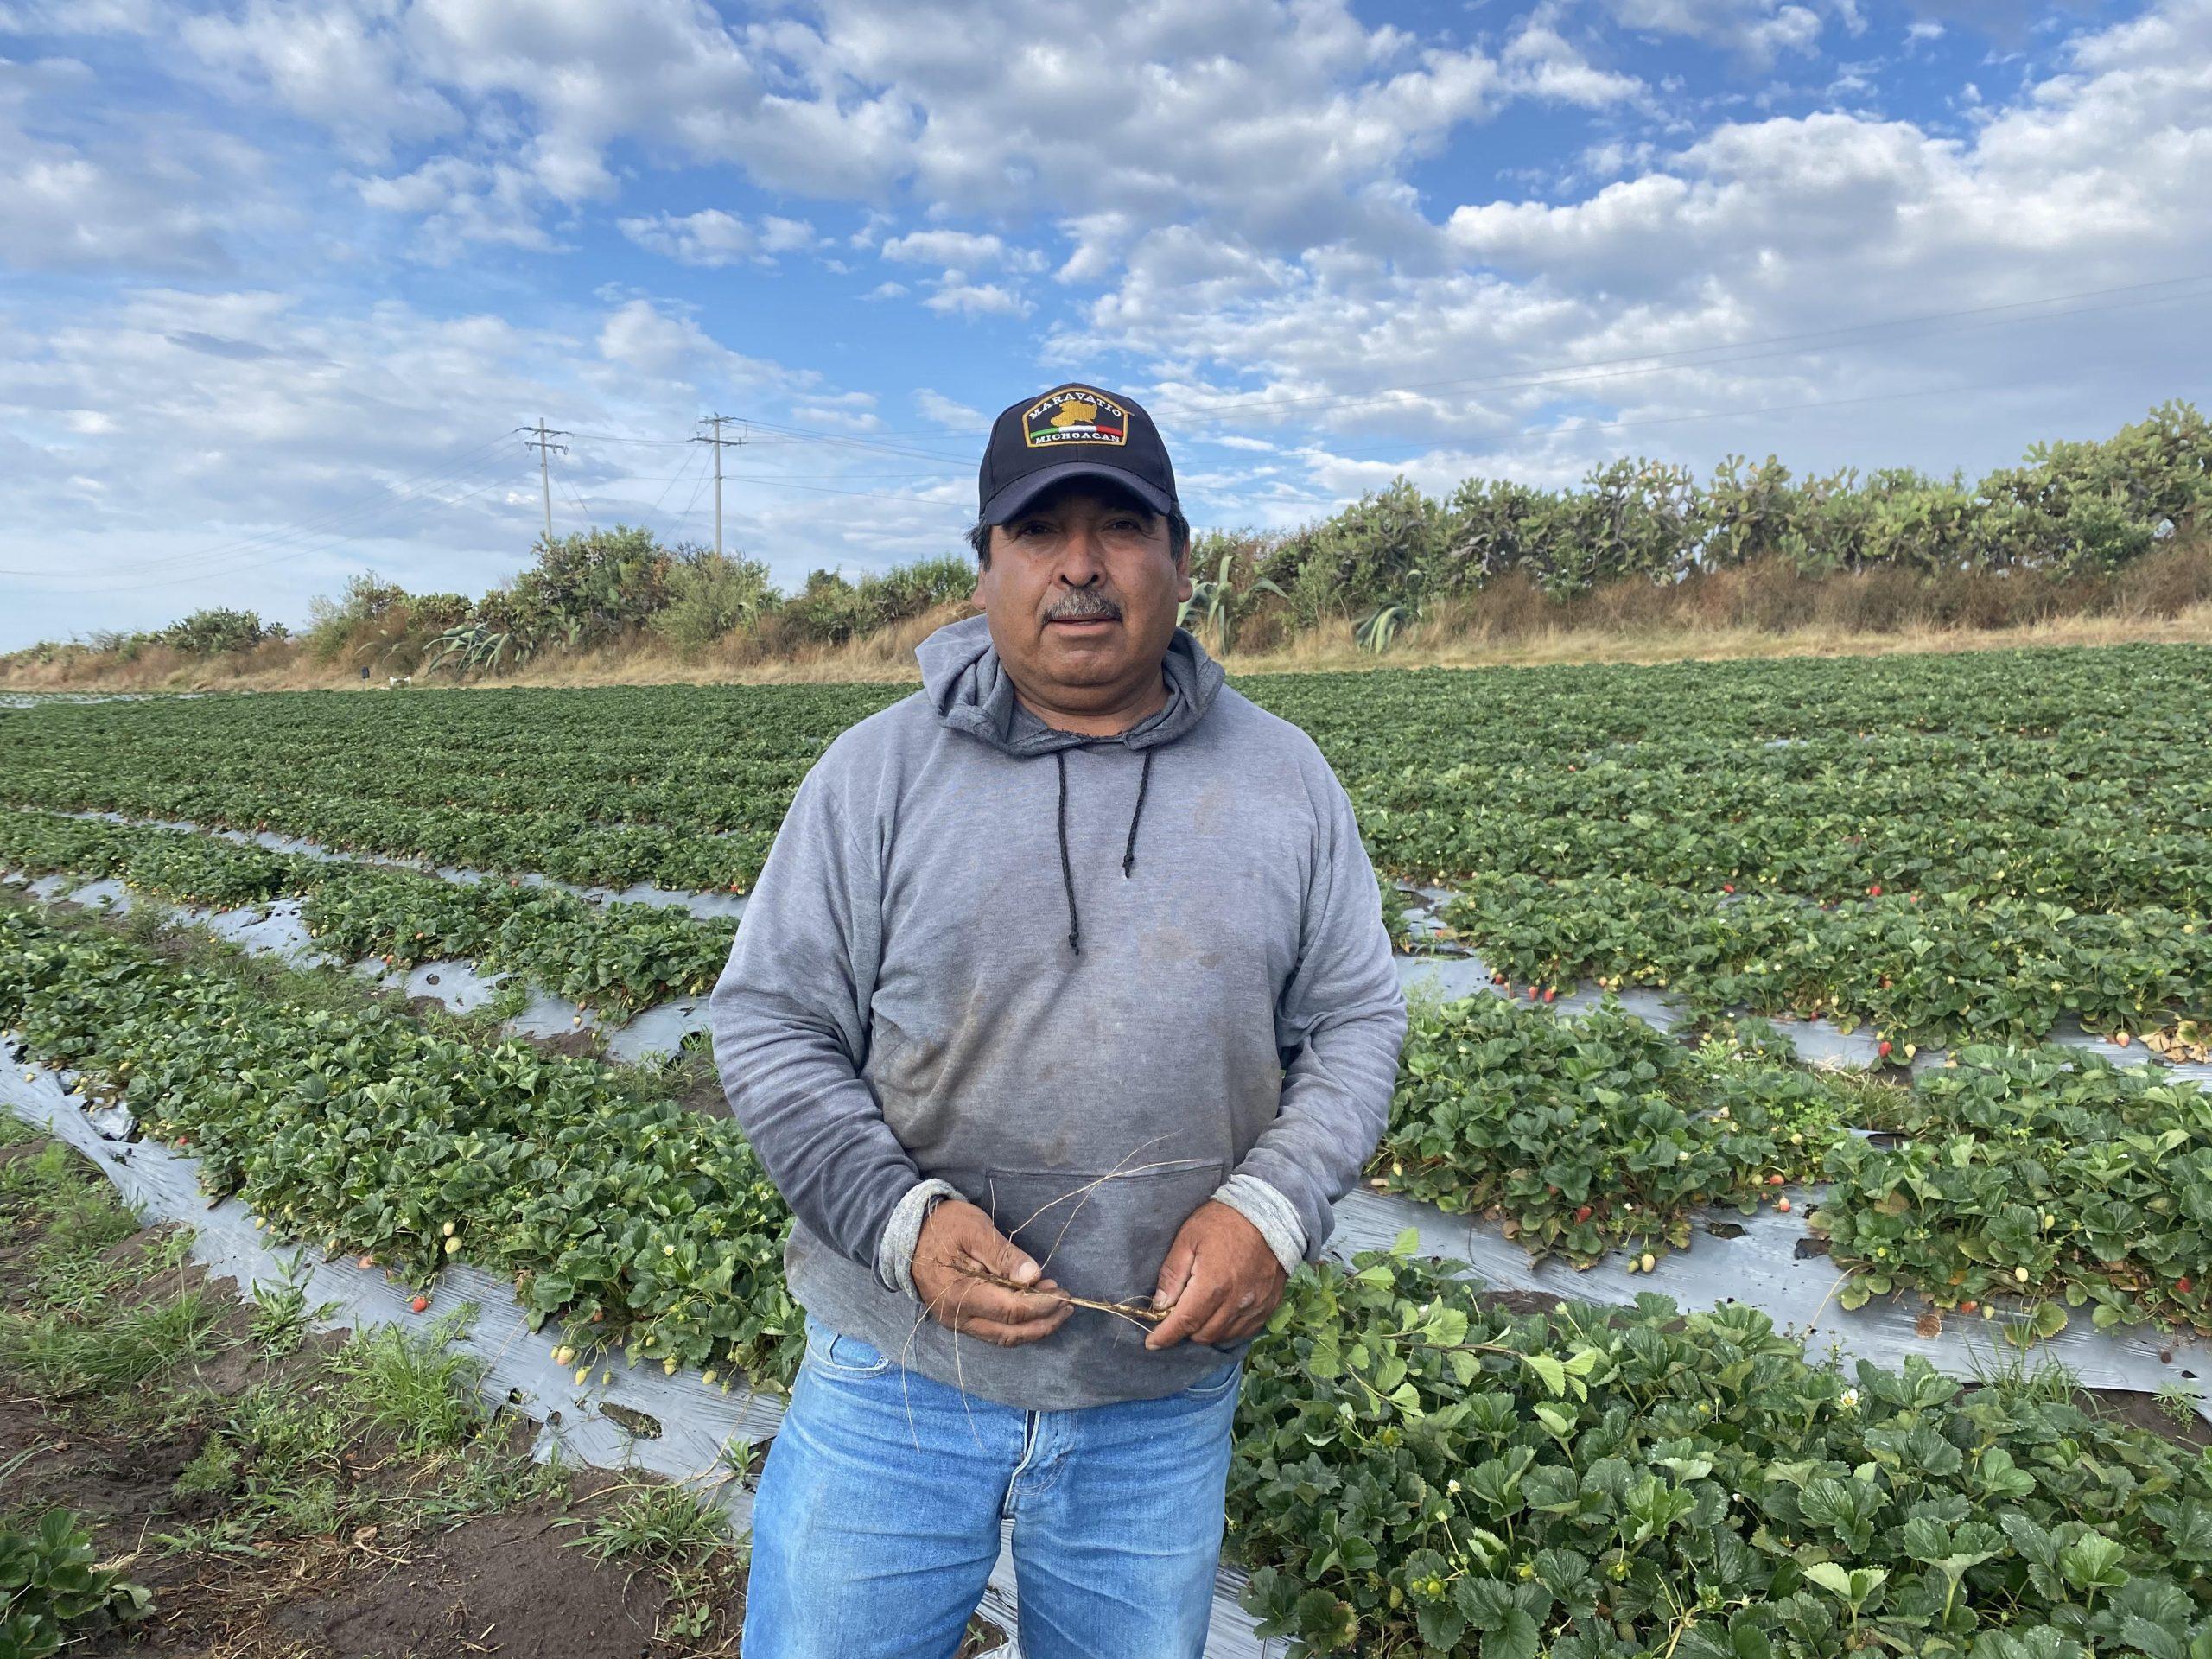 Better farming techniques improve income for José